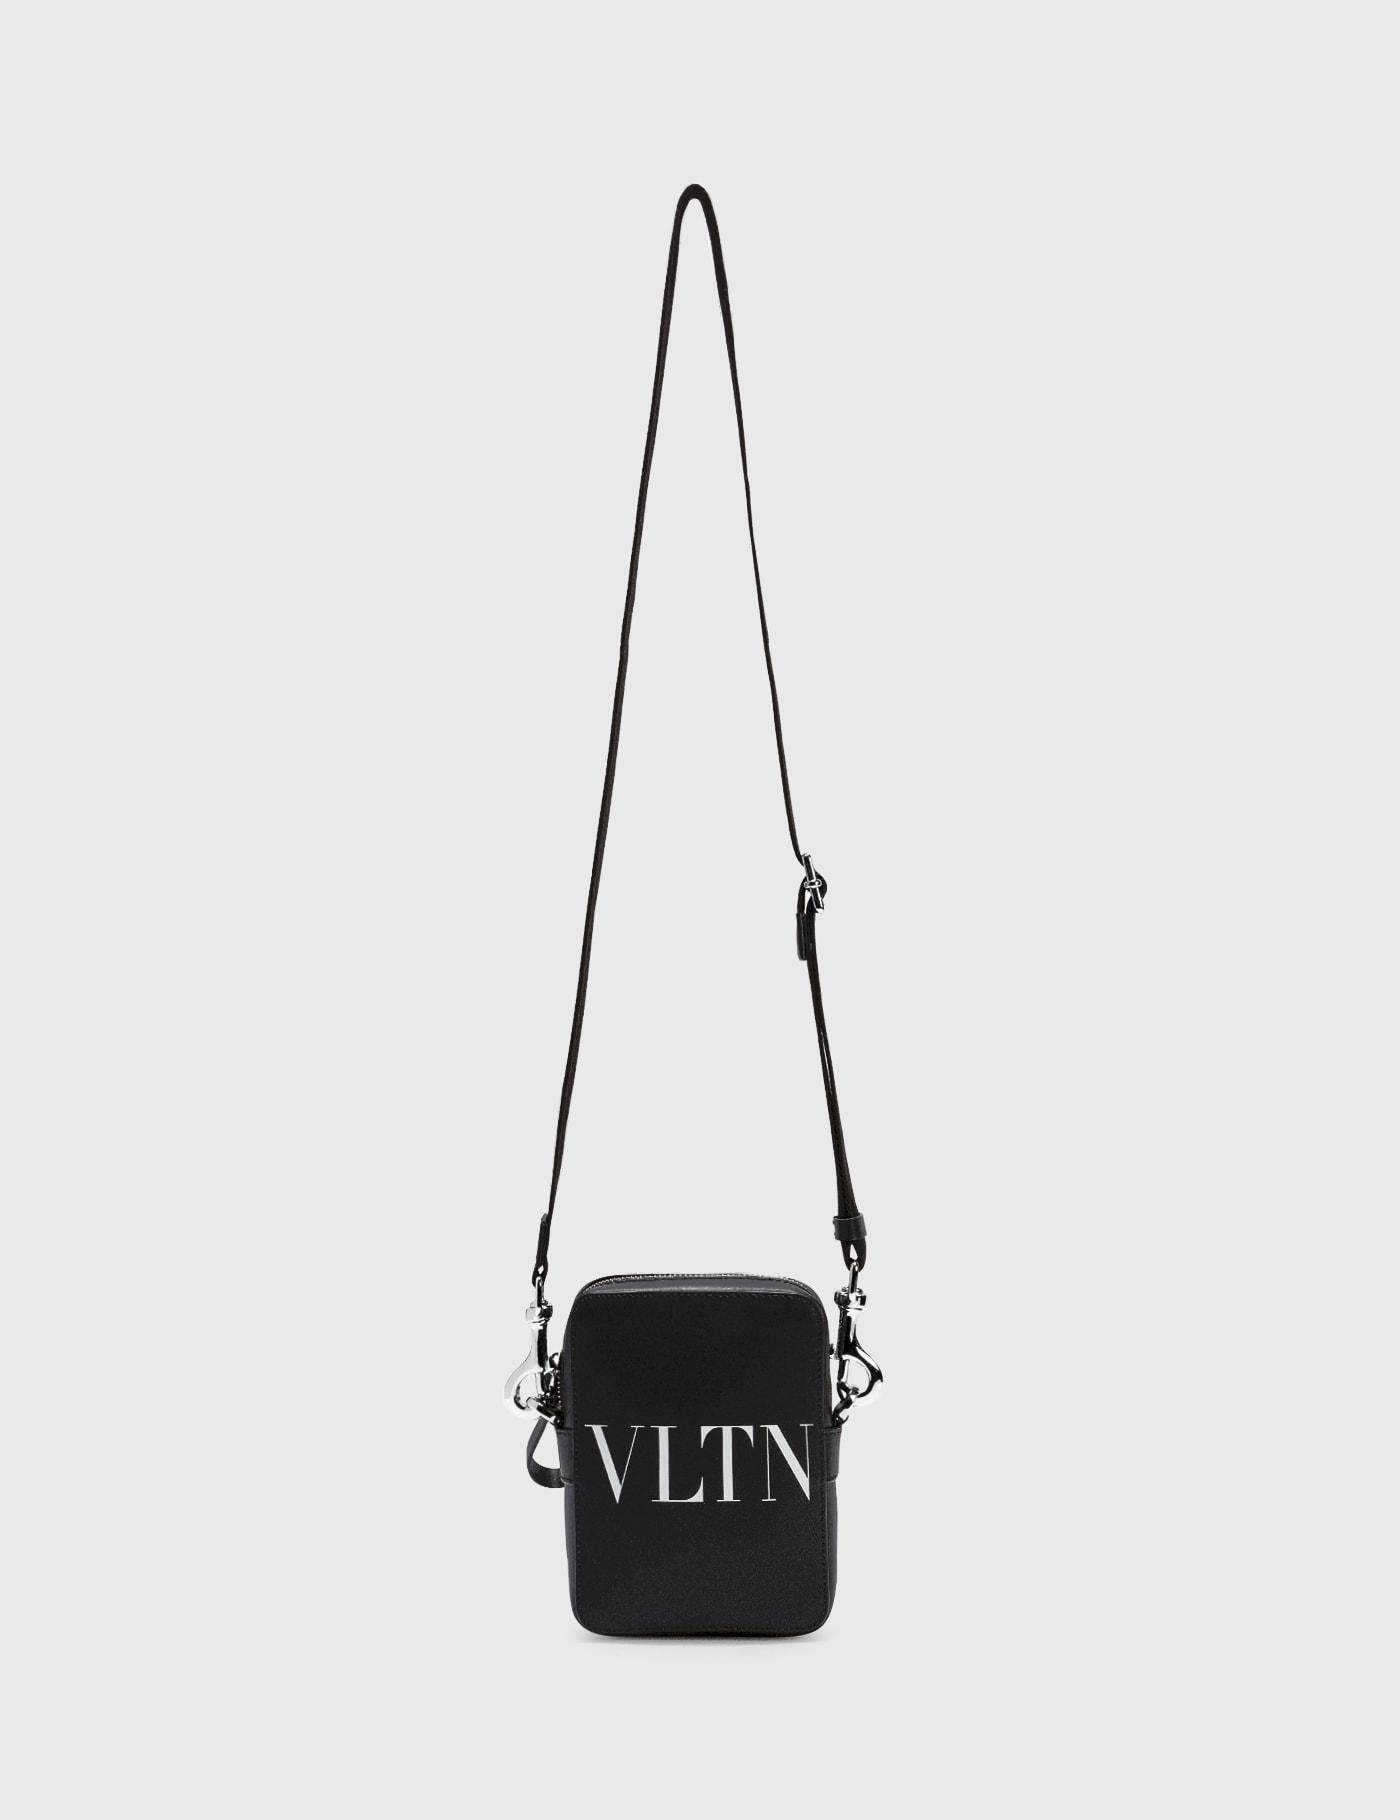 Valentino GARAVANI SMALL VLTN LEATHER CROSSBODY BAG